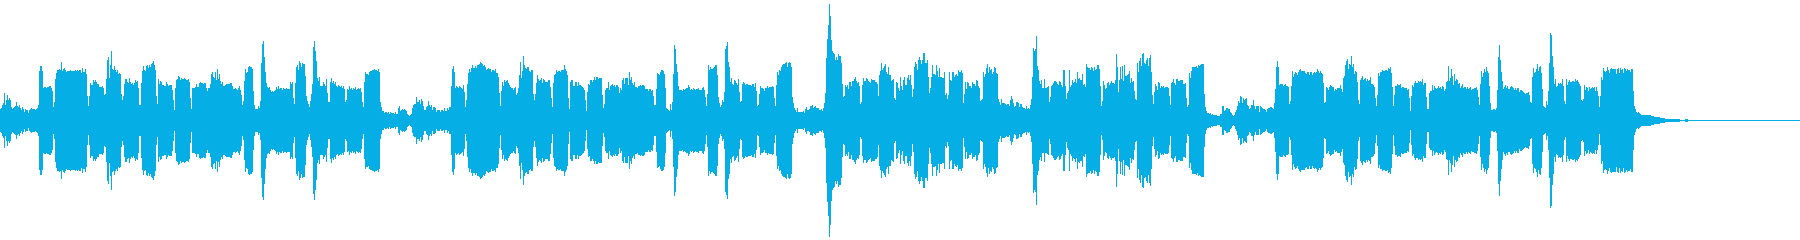 CMソング風スイングBGMの再生済みの波形